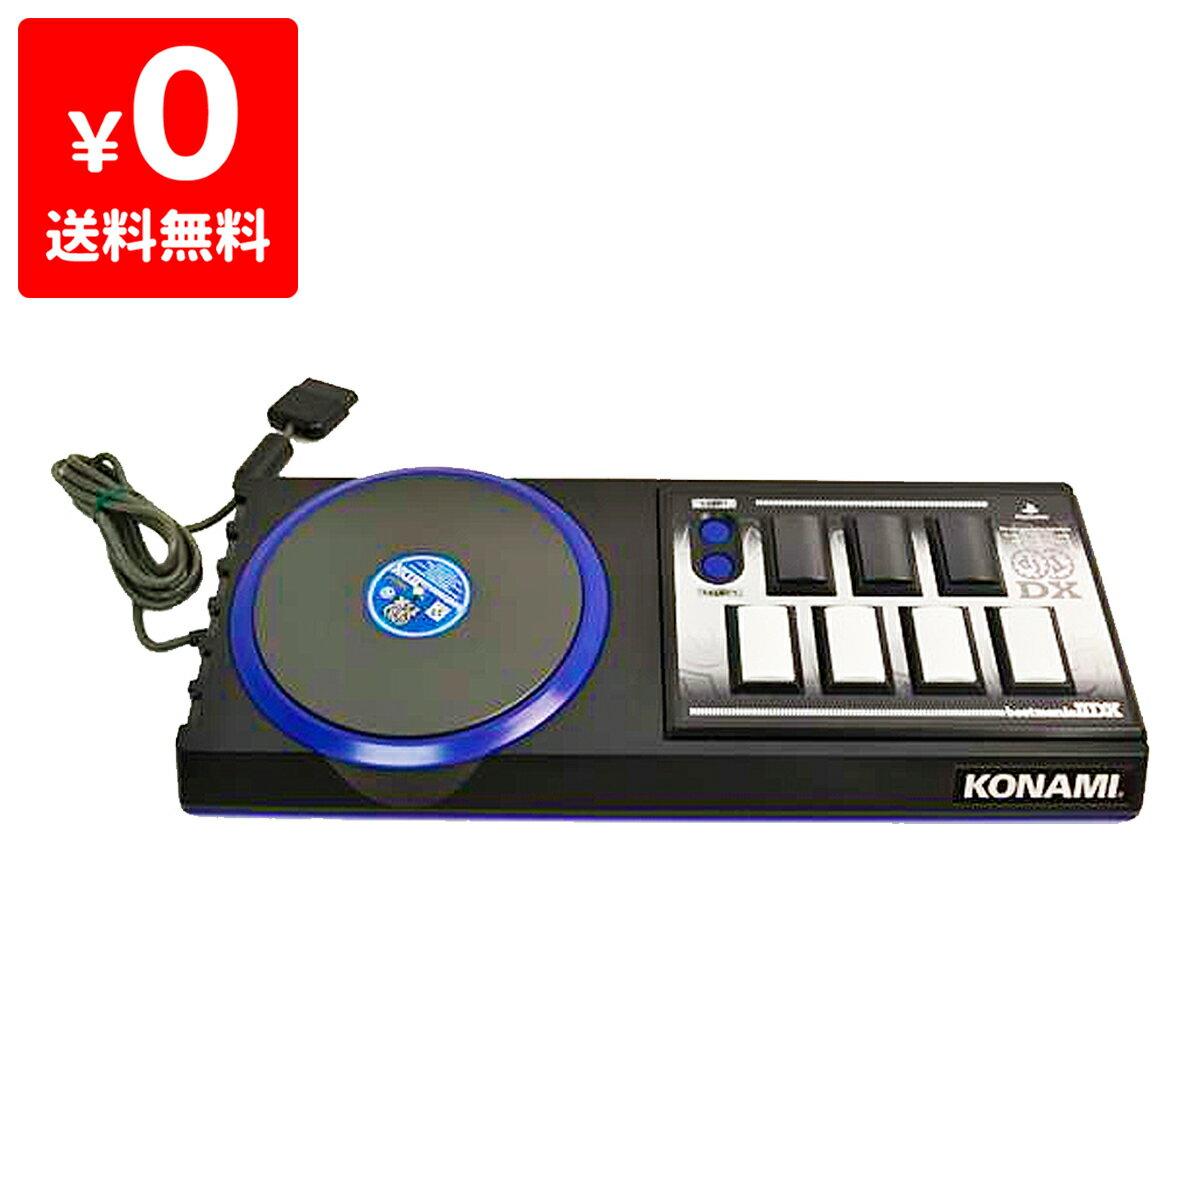 PS2 ビートマニア2 DX専用コントローラ 中古 4988602113617 送料無料 【中古】